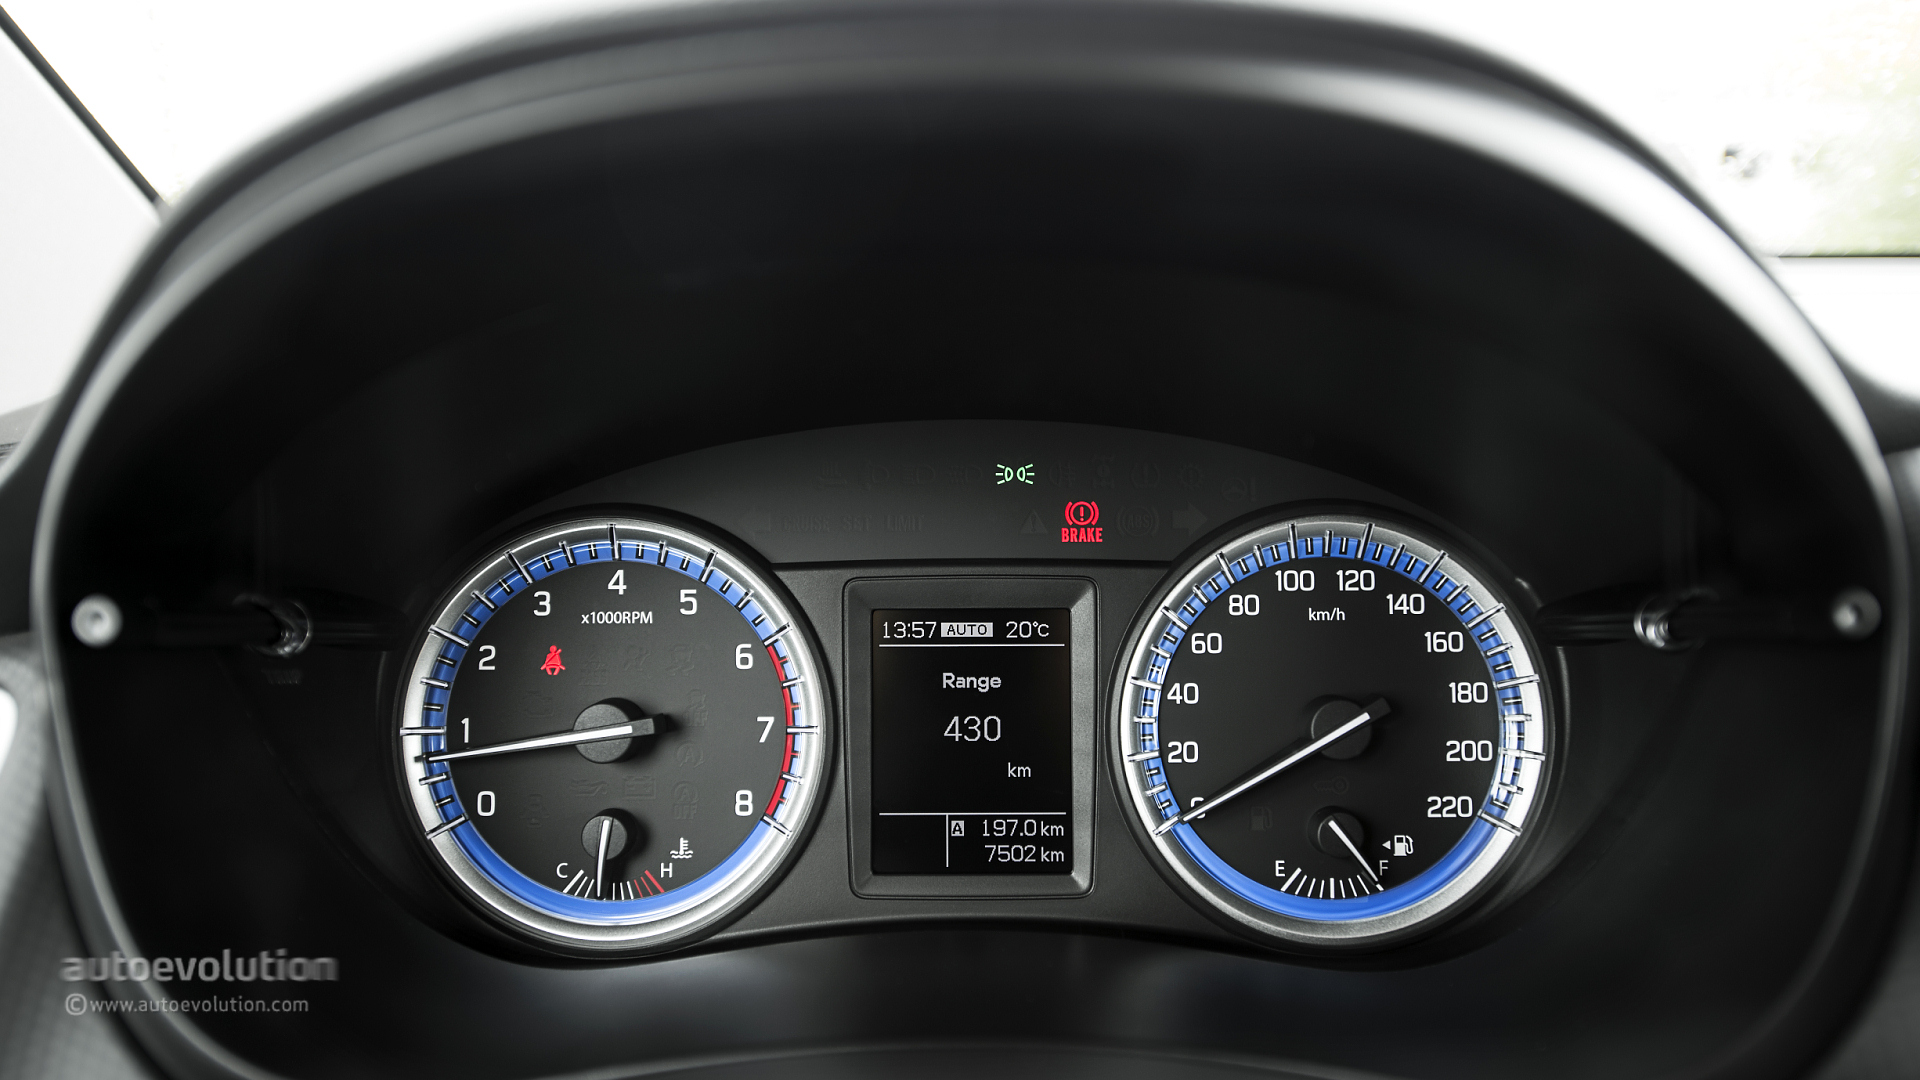 2014 Suzuki SX-4 S-Cross First Drive - autoevolution